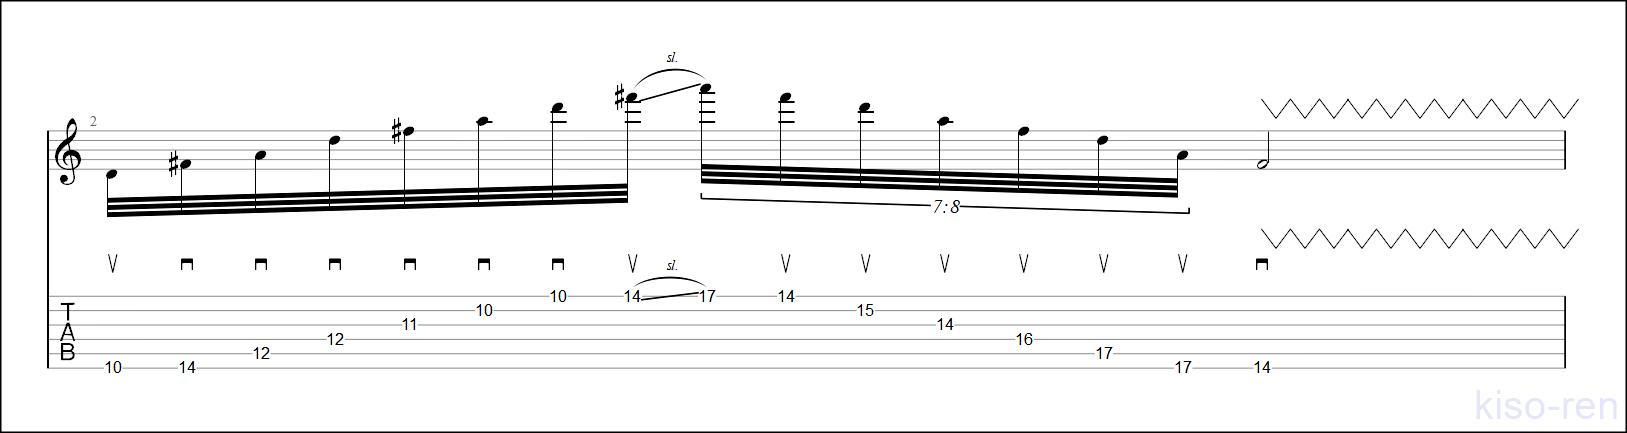 D Sweep Picking【TAB】Big Sweep Picking John Petrucci  6弦スウィープピッキング ジョン・ペトルーシ 練習【Practice TAB】